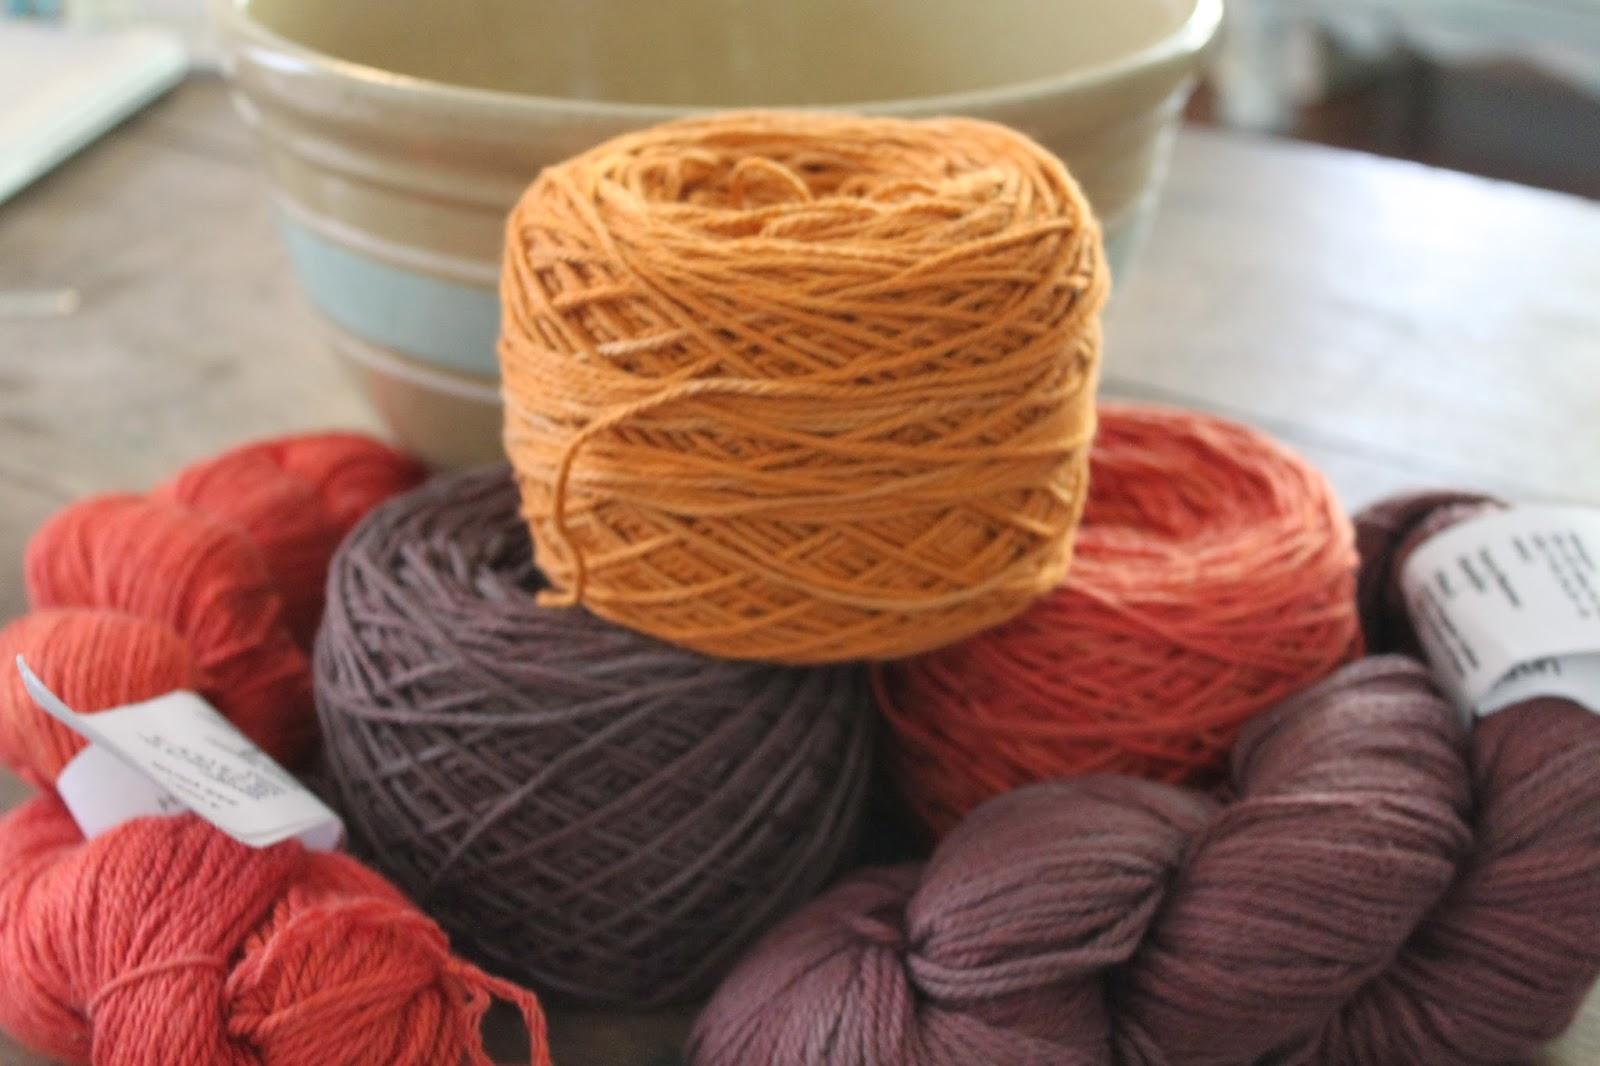 yarn, String, Pattern, Knitting, Rope, Psychedelic, Bokeh